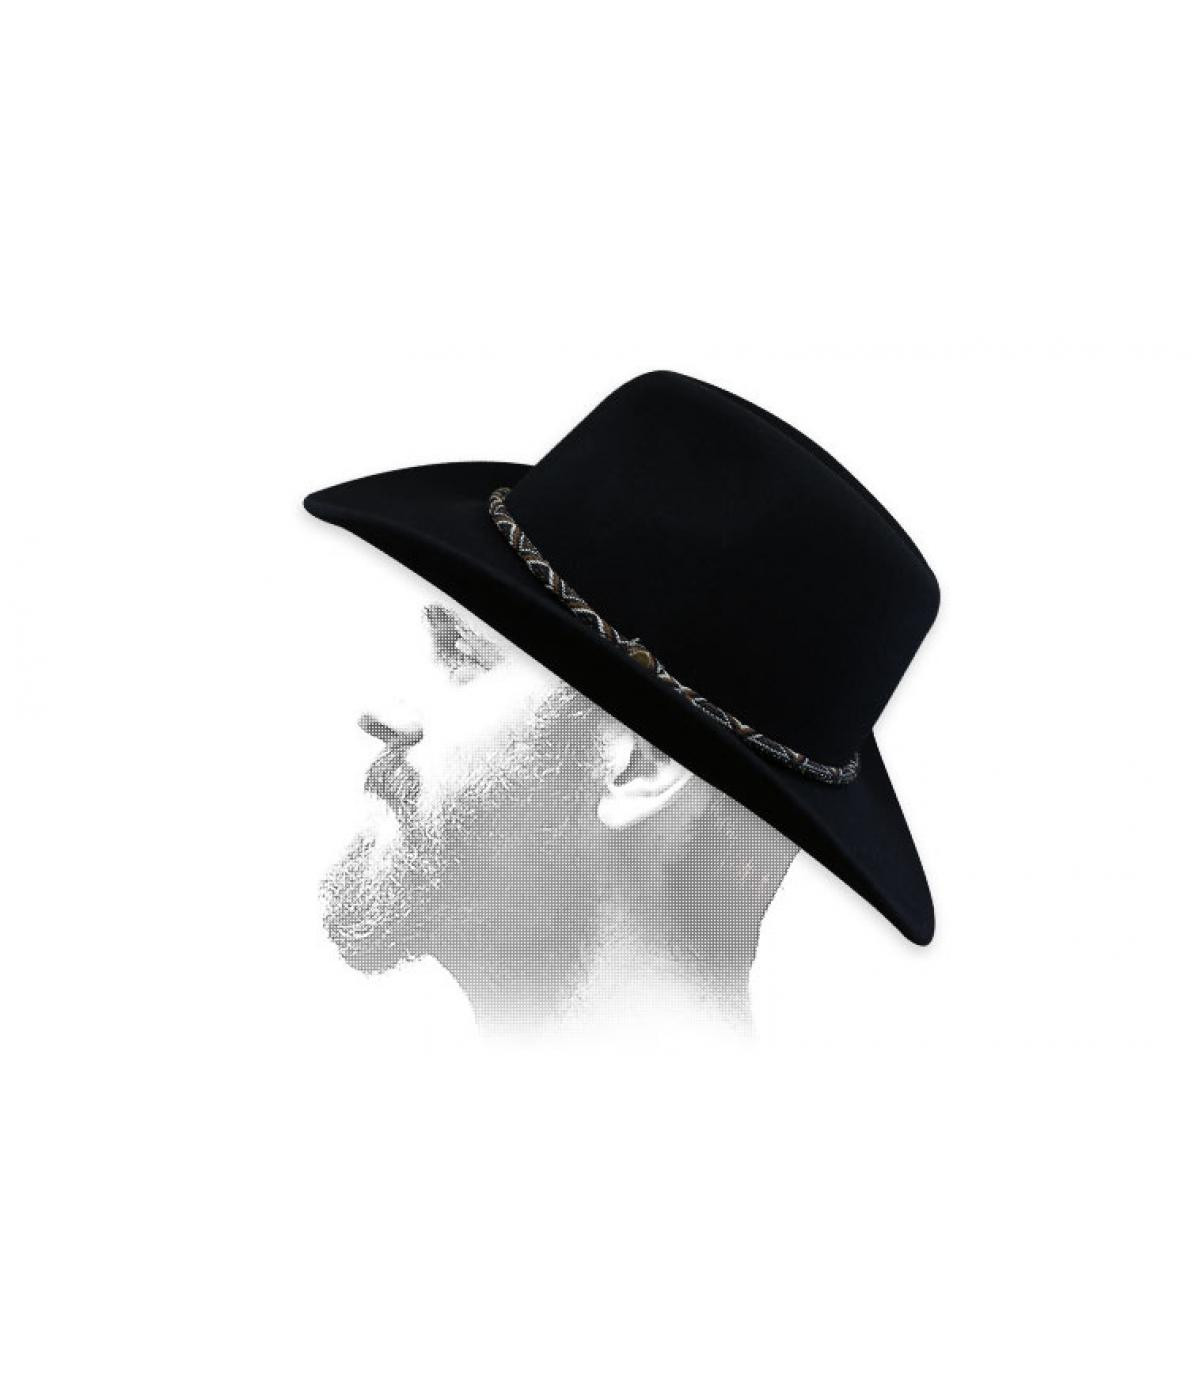 Beige felt cowboy hat